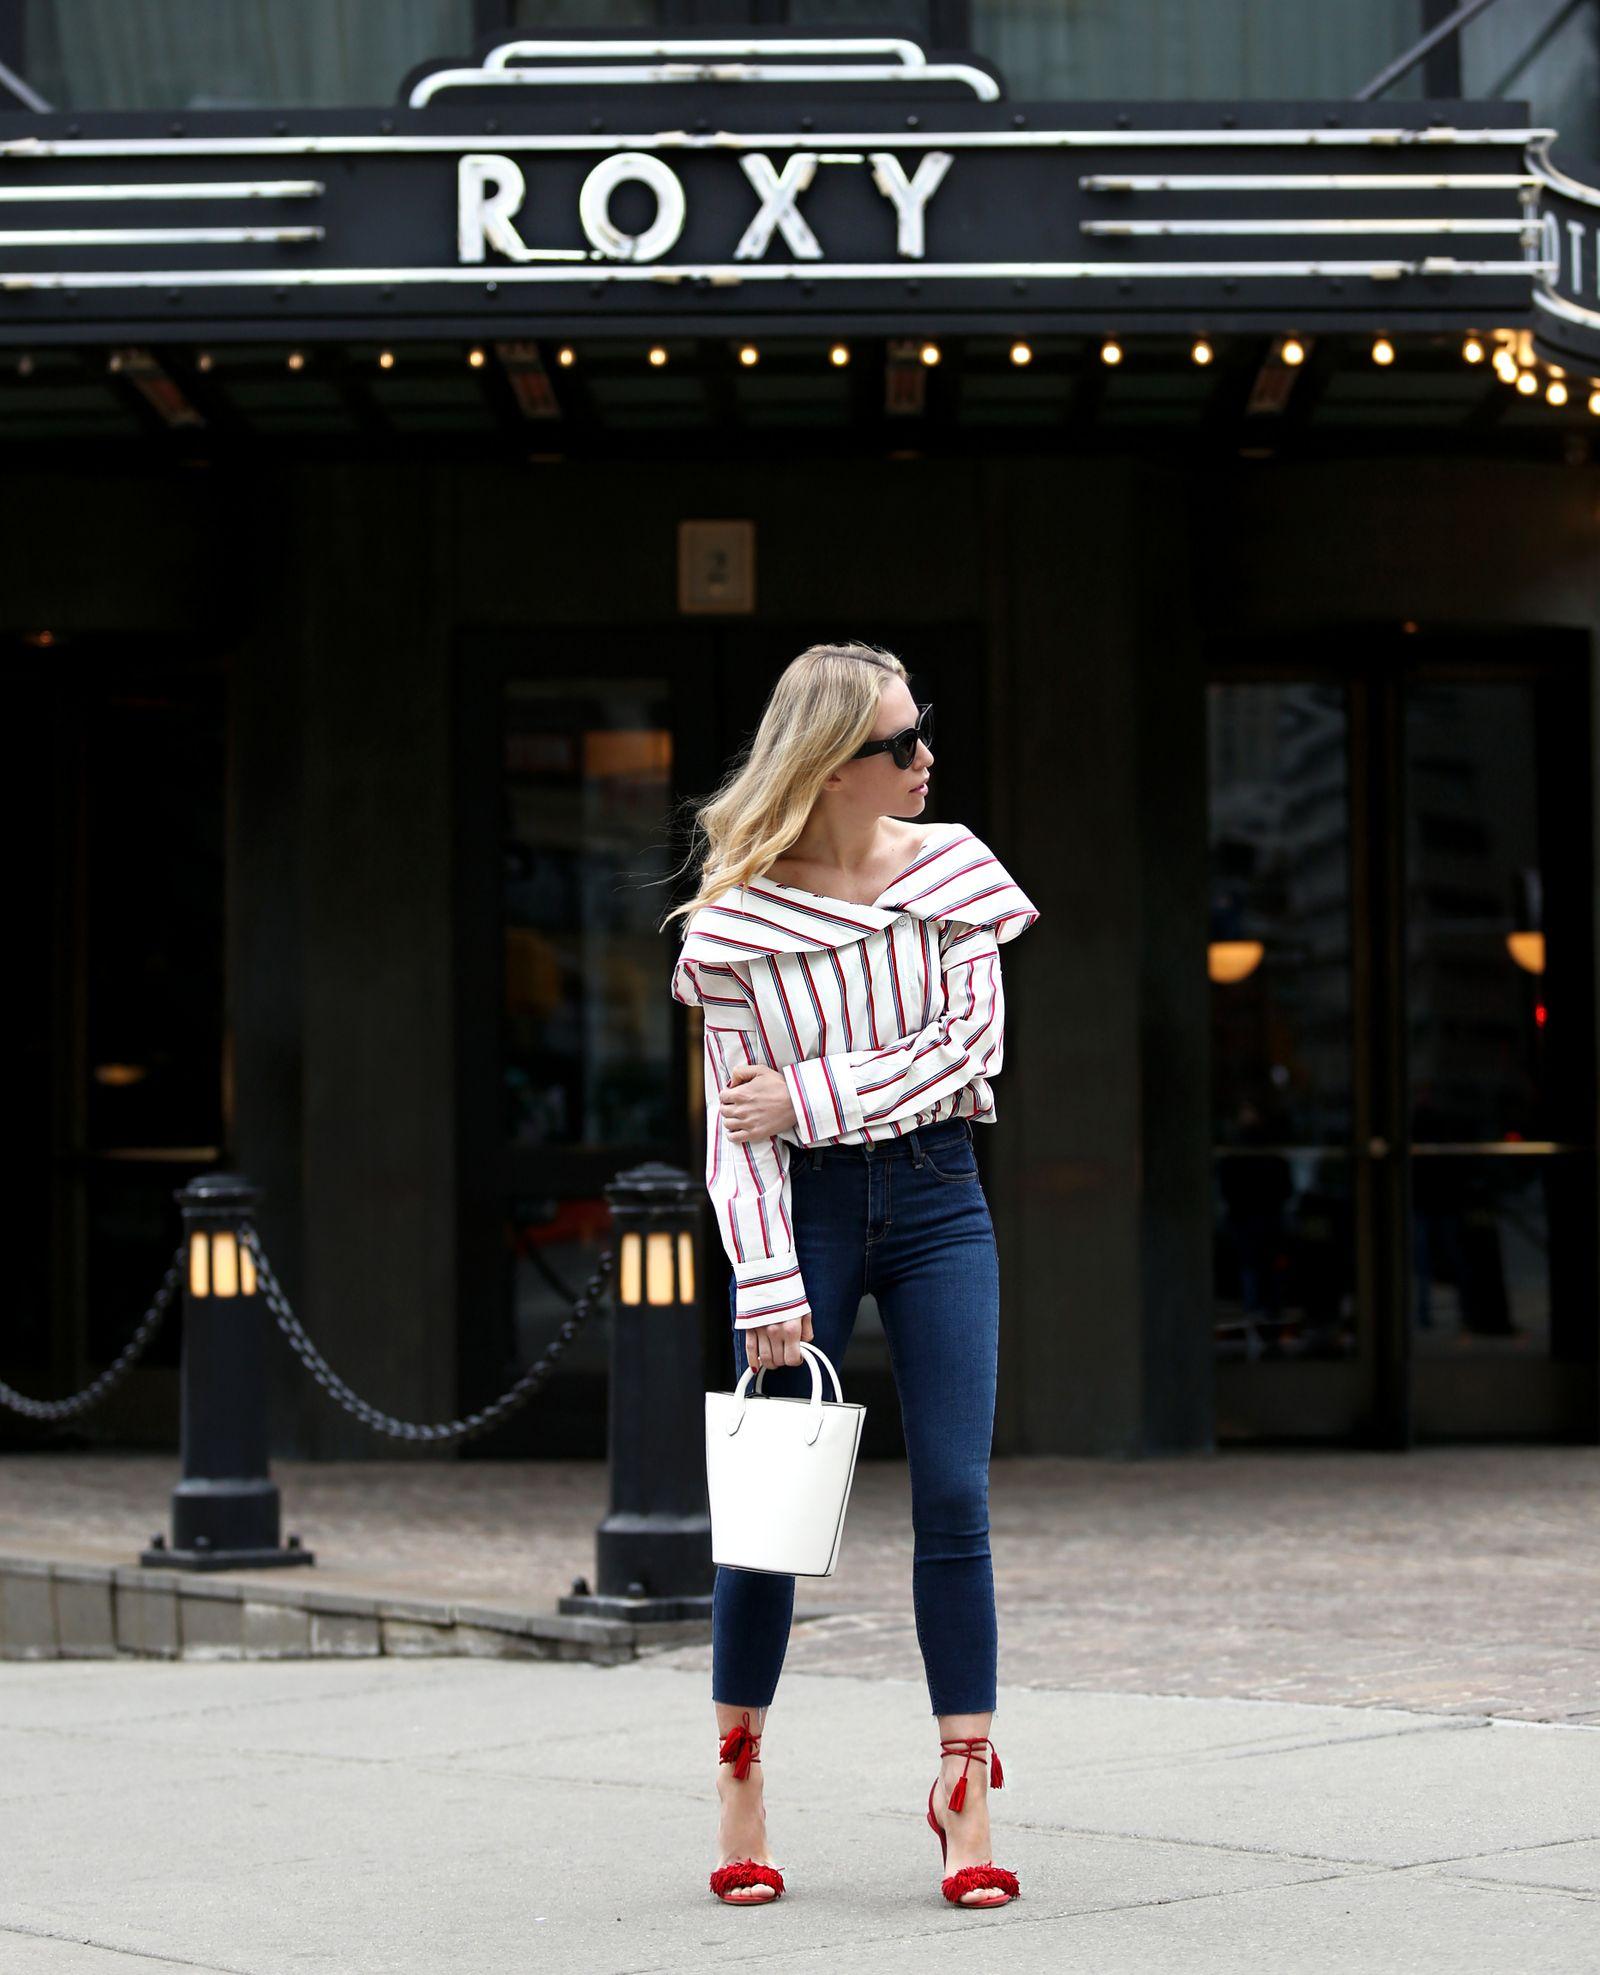 Roxy Hotel NYC Staycation - Helena Glazer of Brooklyn Blonde wearing Storets top with Topshop denim, red Aquazzura Wild Things heels, Celine sunglasses